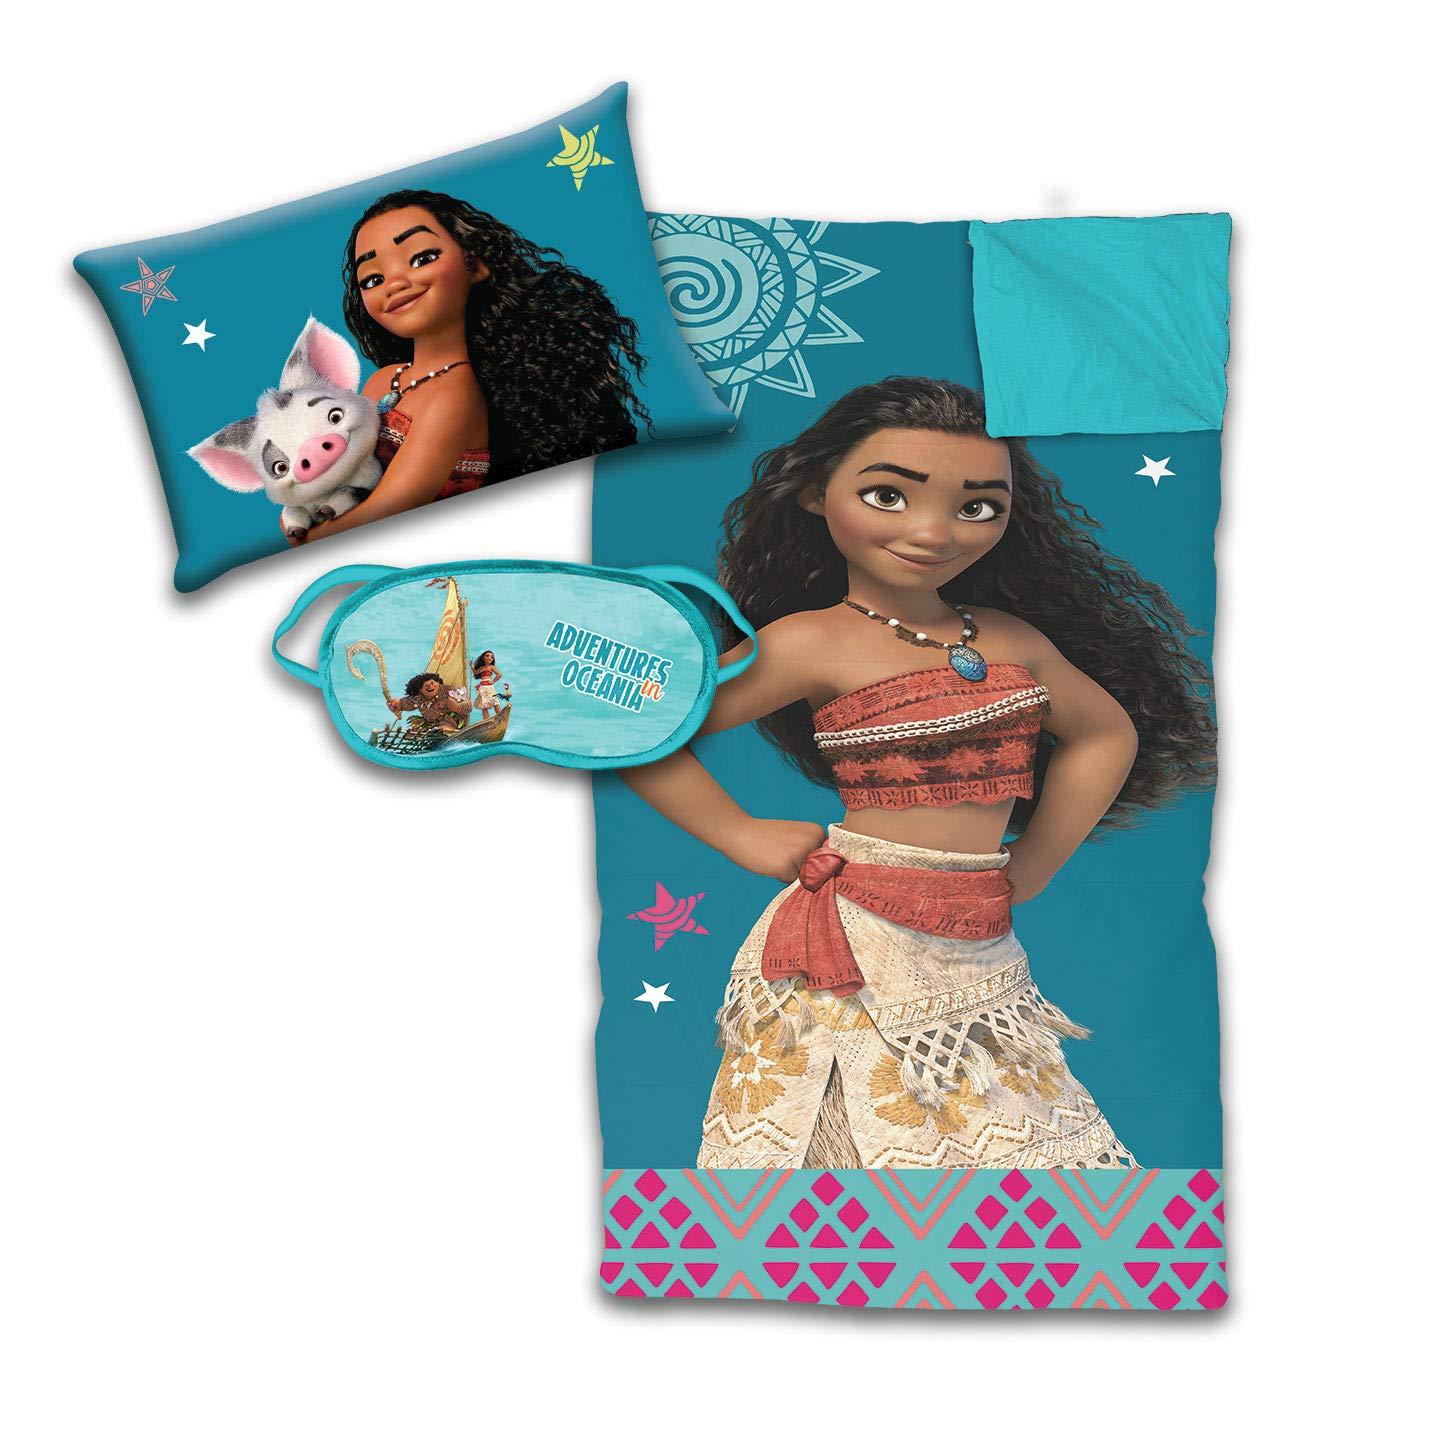 Jay Franco Disney Moana 3 Piece Sleepover Set - Cozy & Warm Kids Slumber Bag with Pillow & Eye Mask - Featuring Pua (Official Disney Product)